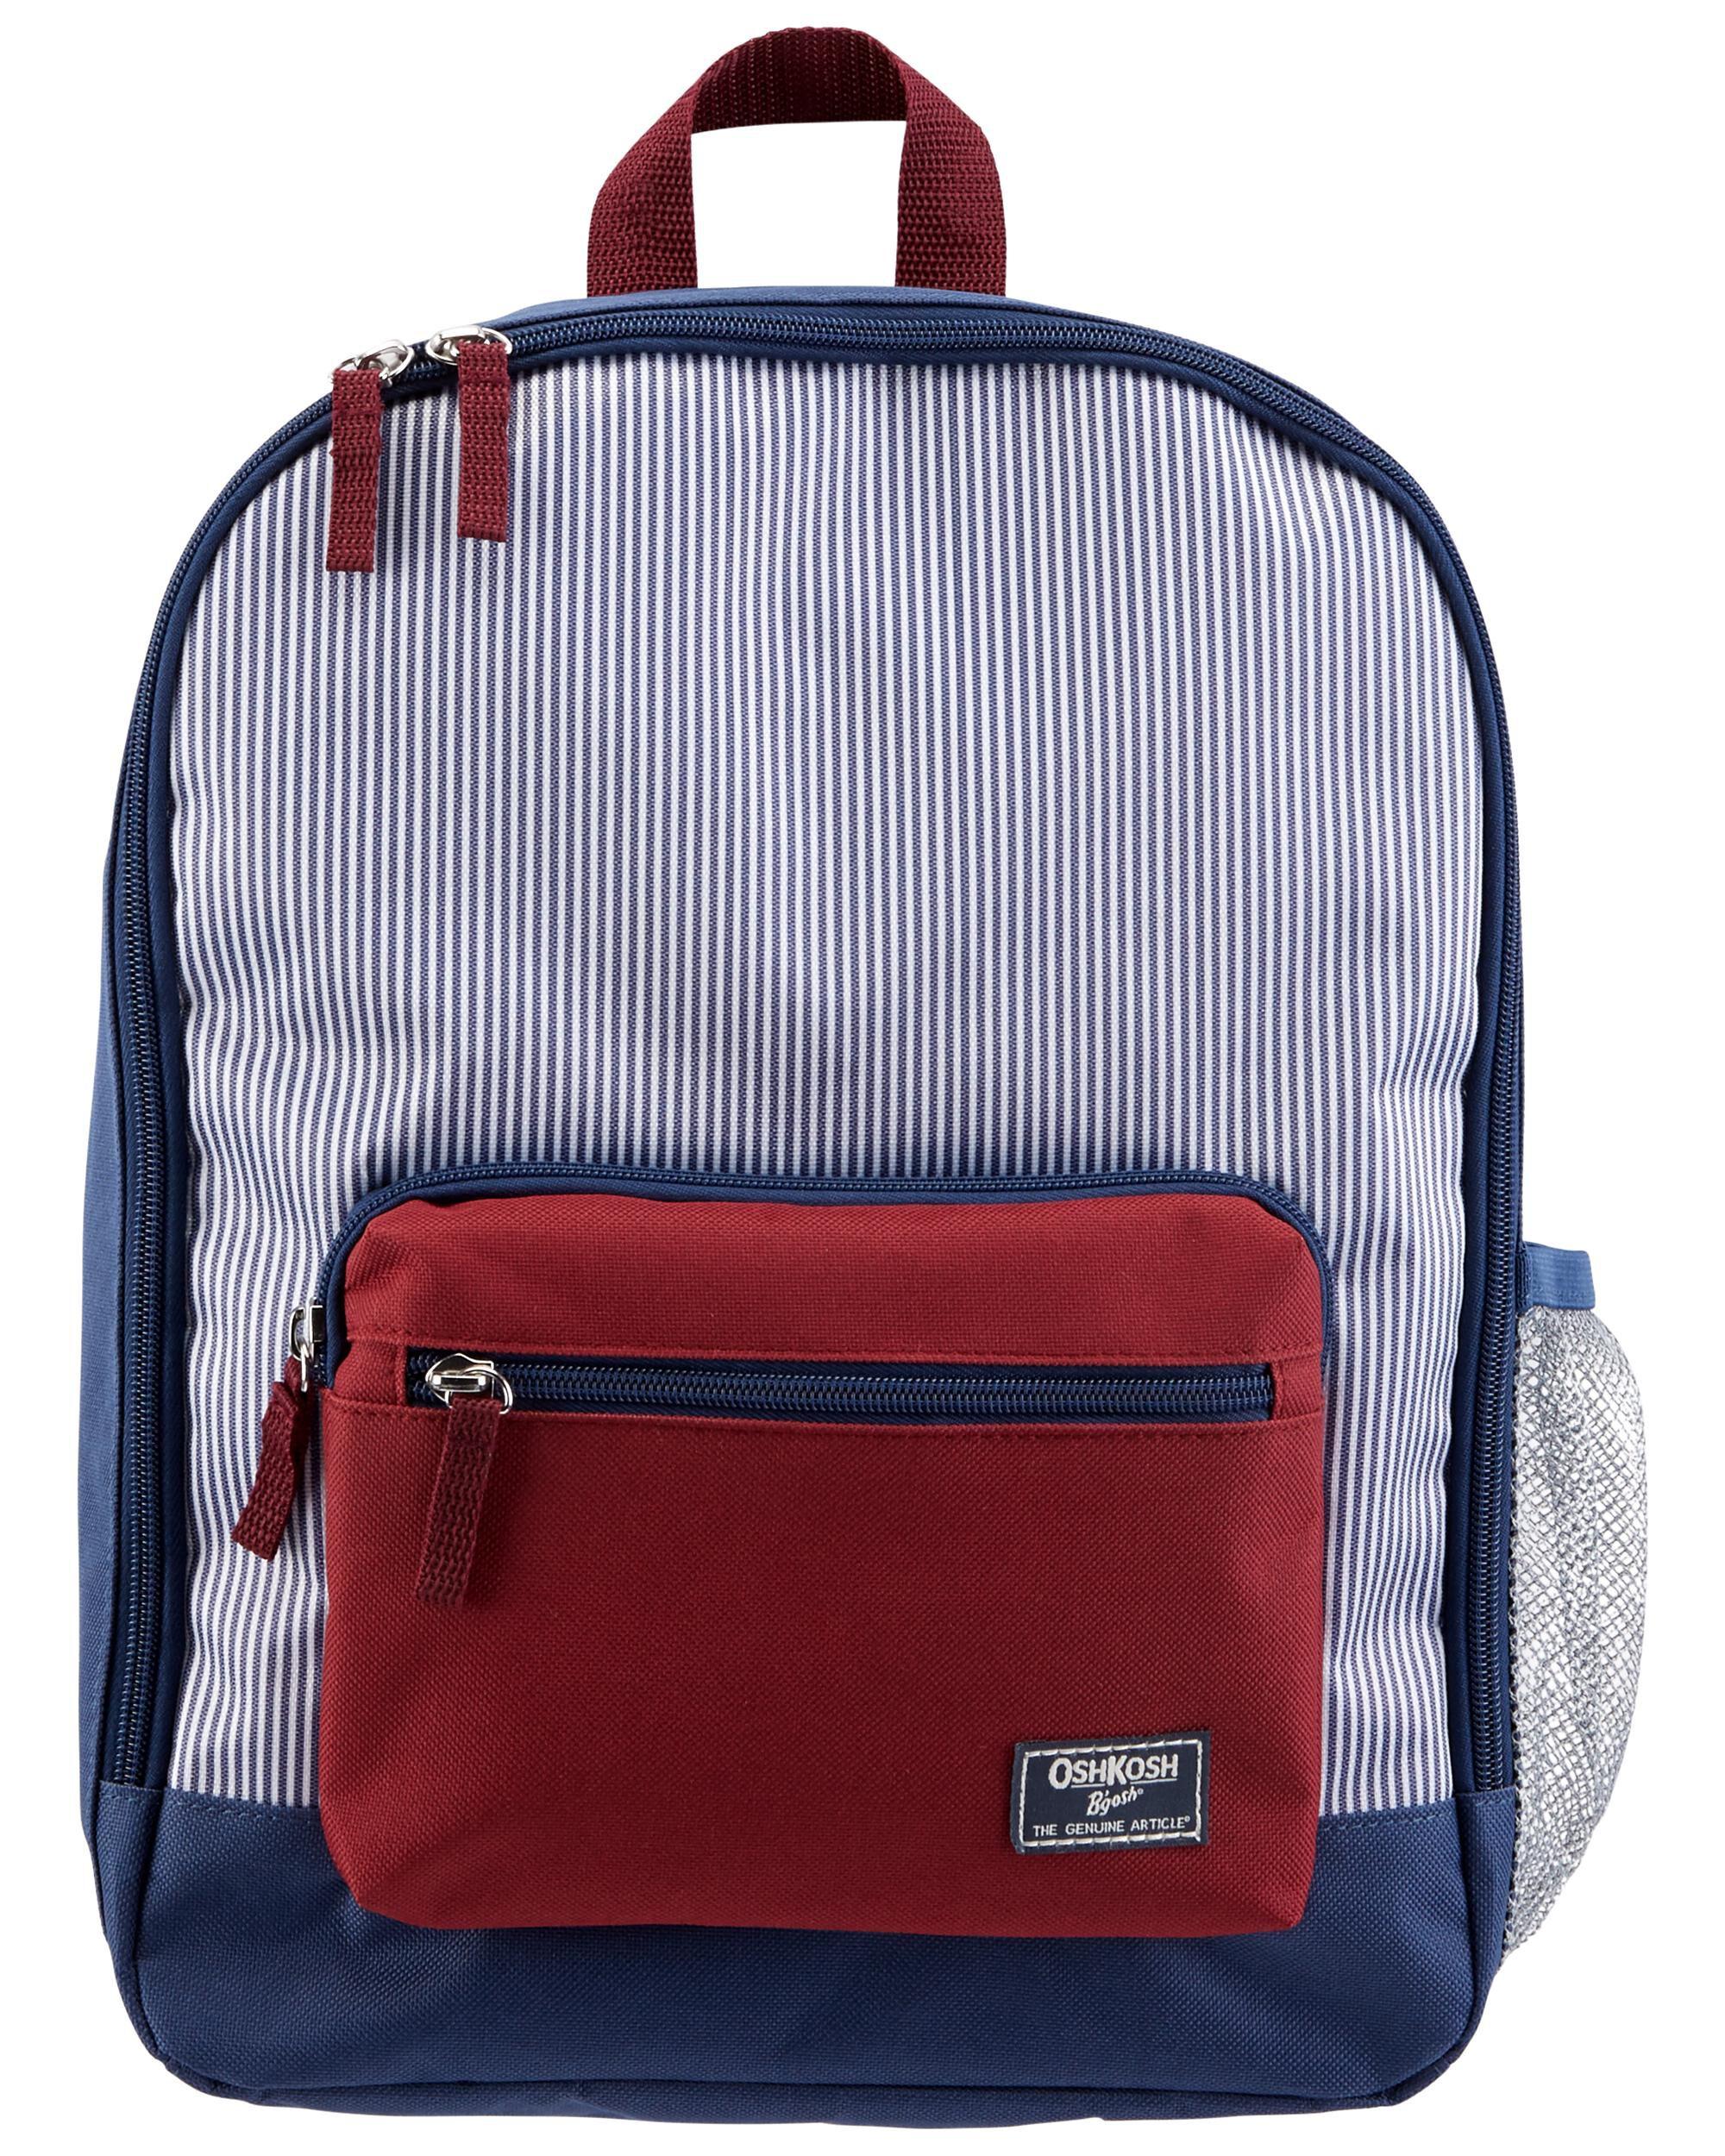 Oshkosh By Skip Hop Backpack Skiphop Com